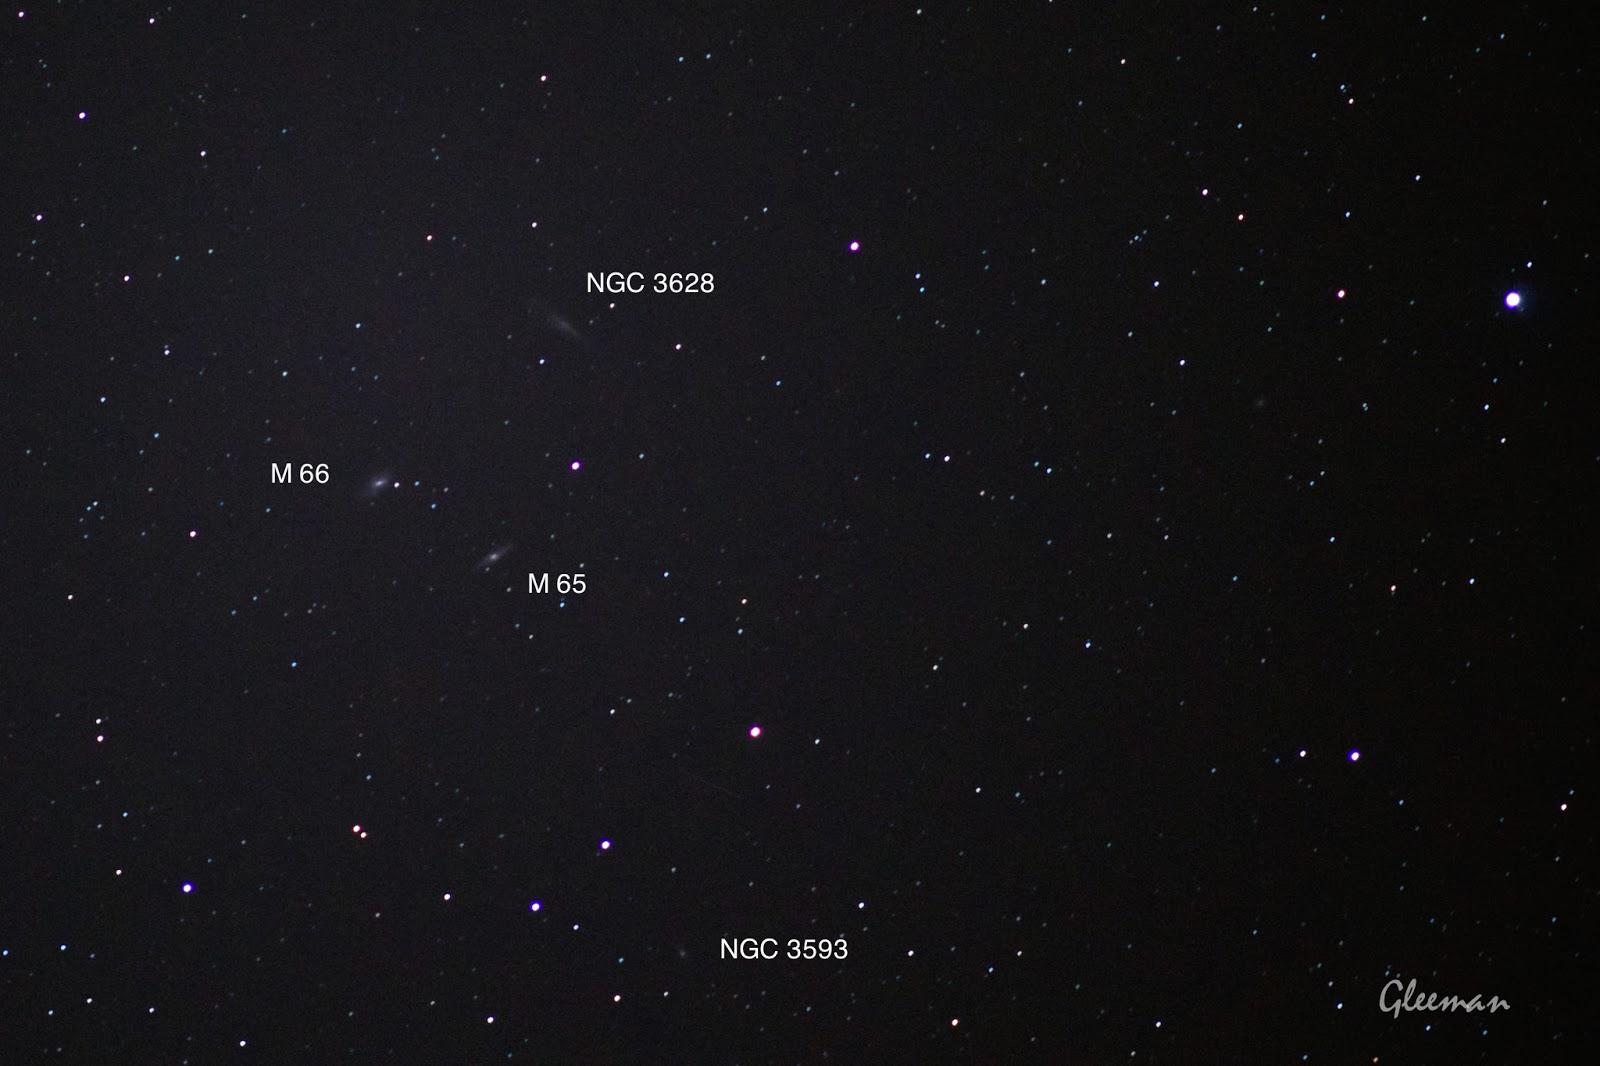 NGC 3628, M65,M66, NGC 3593/ Pentax  K5 + Pentax O-GPS1 + DA*200